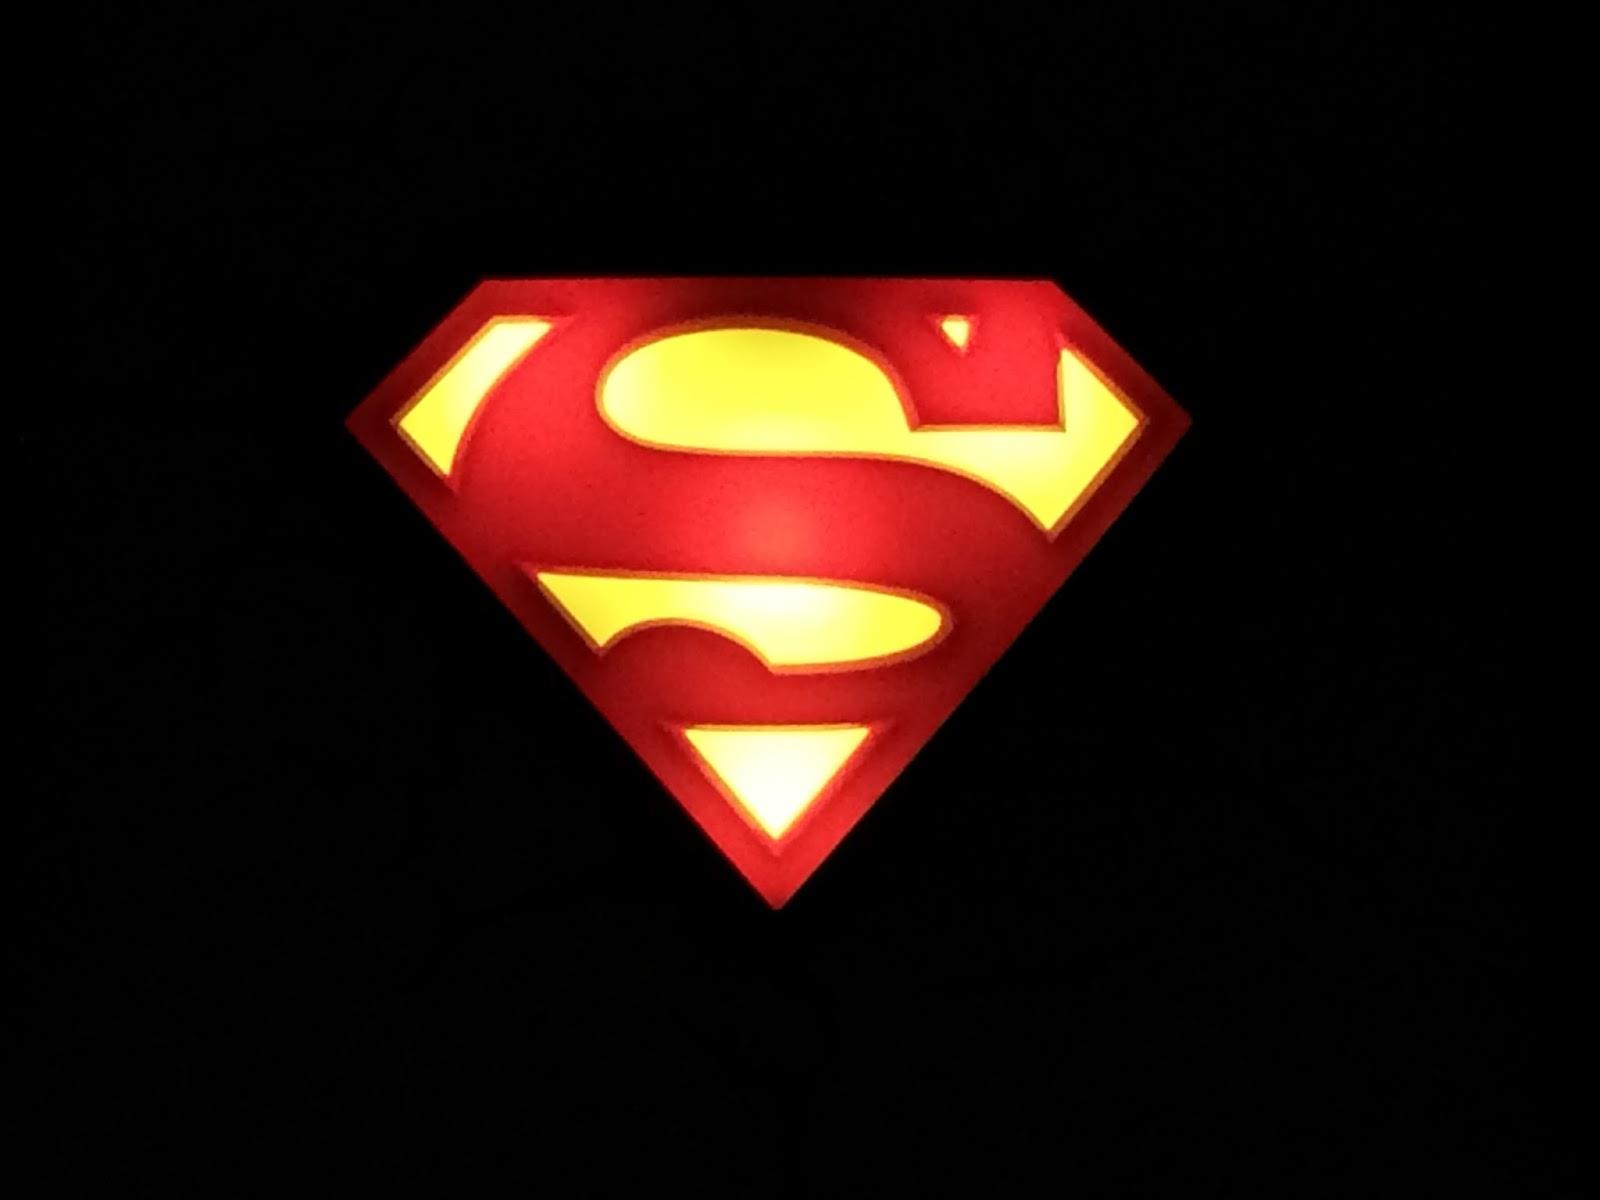 Superhero Themed Bedroom 3dlightfx Review By Kim Elliott Easy Superhero Room Decor